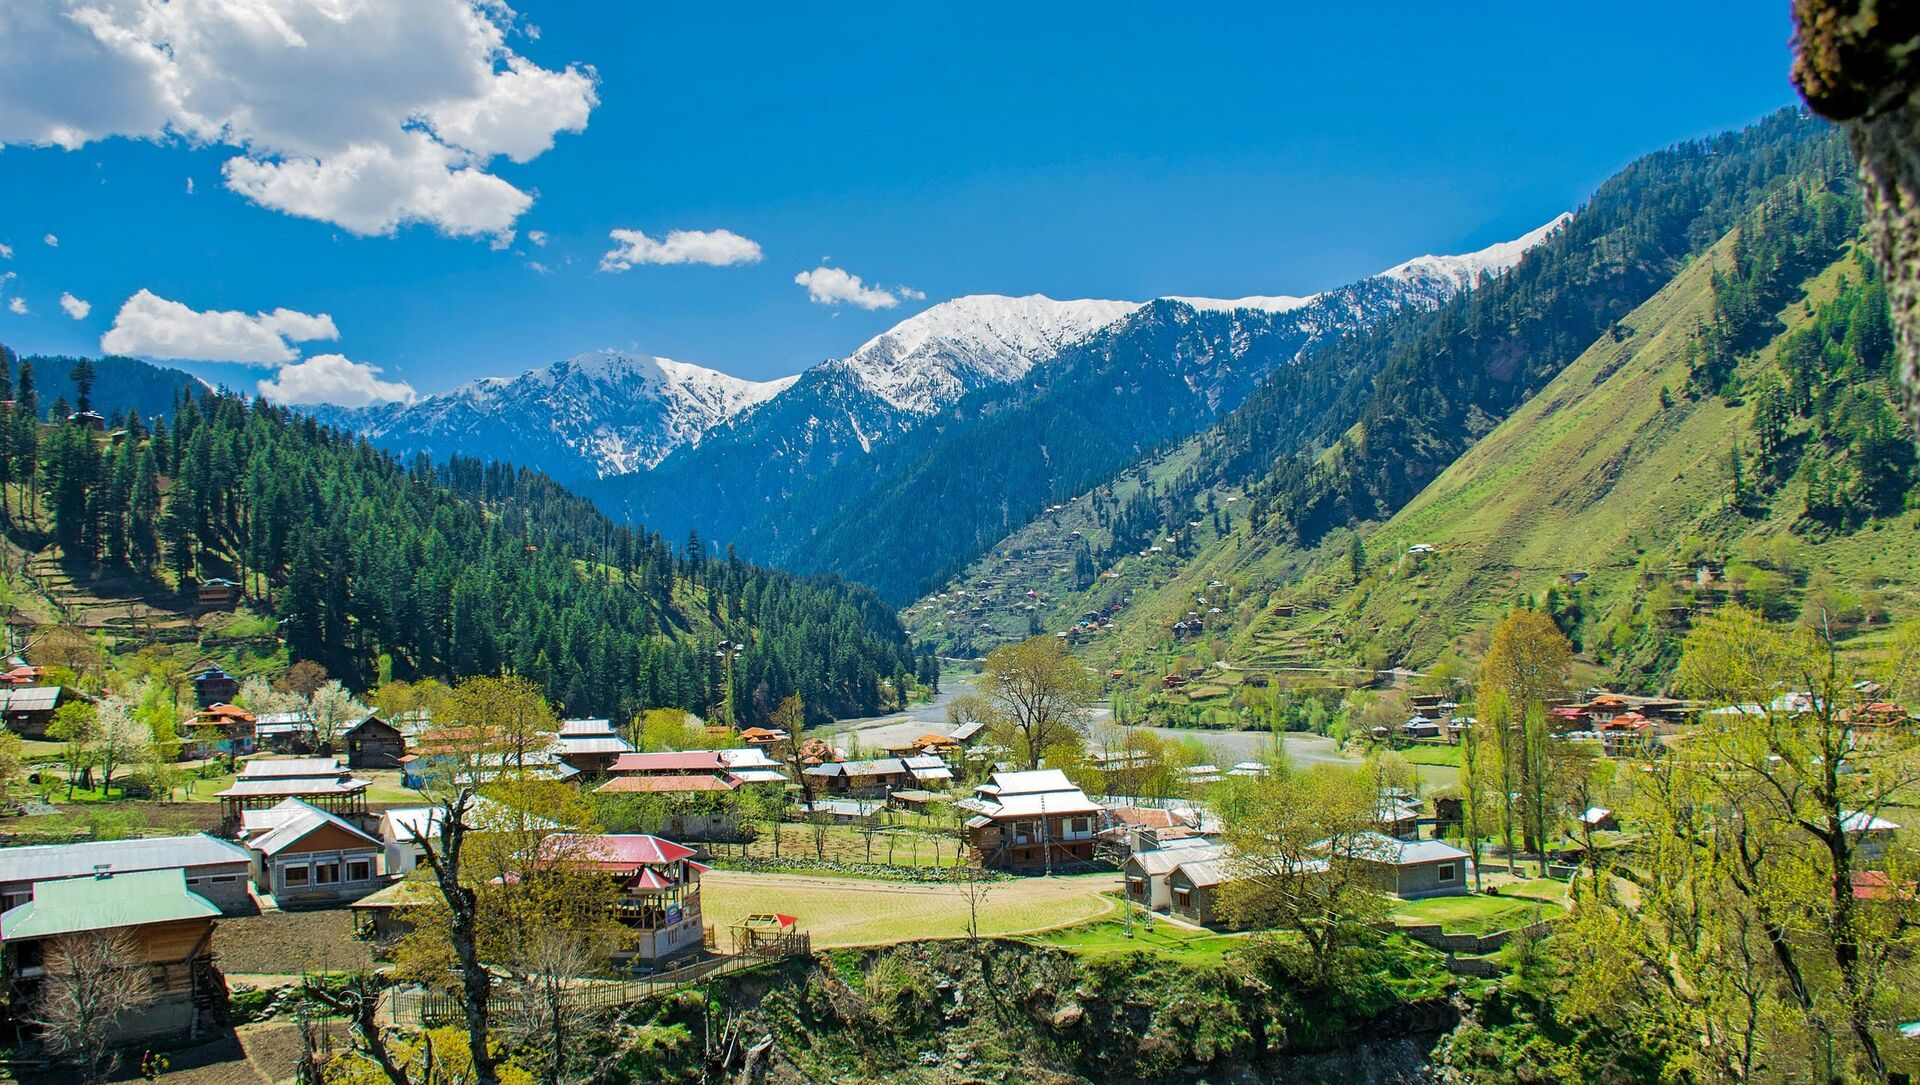 View From Sharda Fort, Azad Kashmir, Pakistan. - Sputnik International, 1920, 26.07.2021